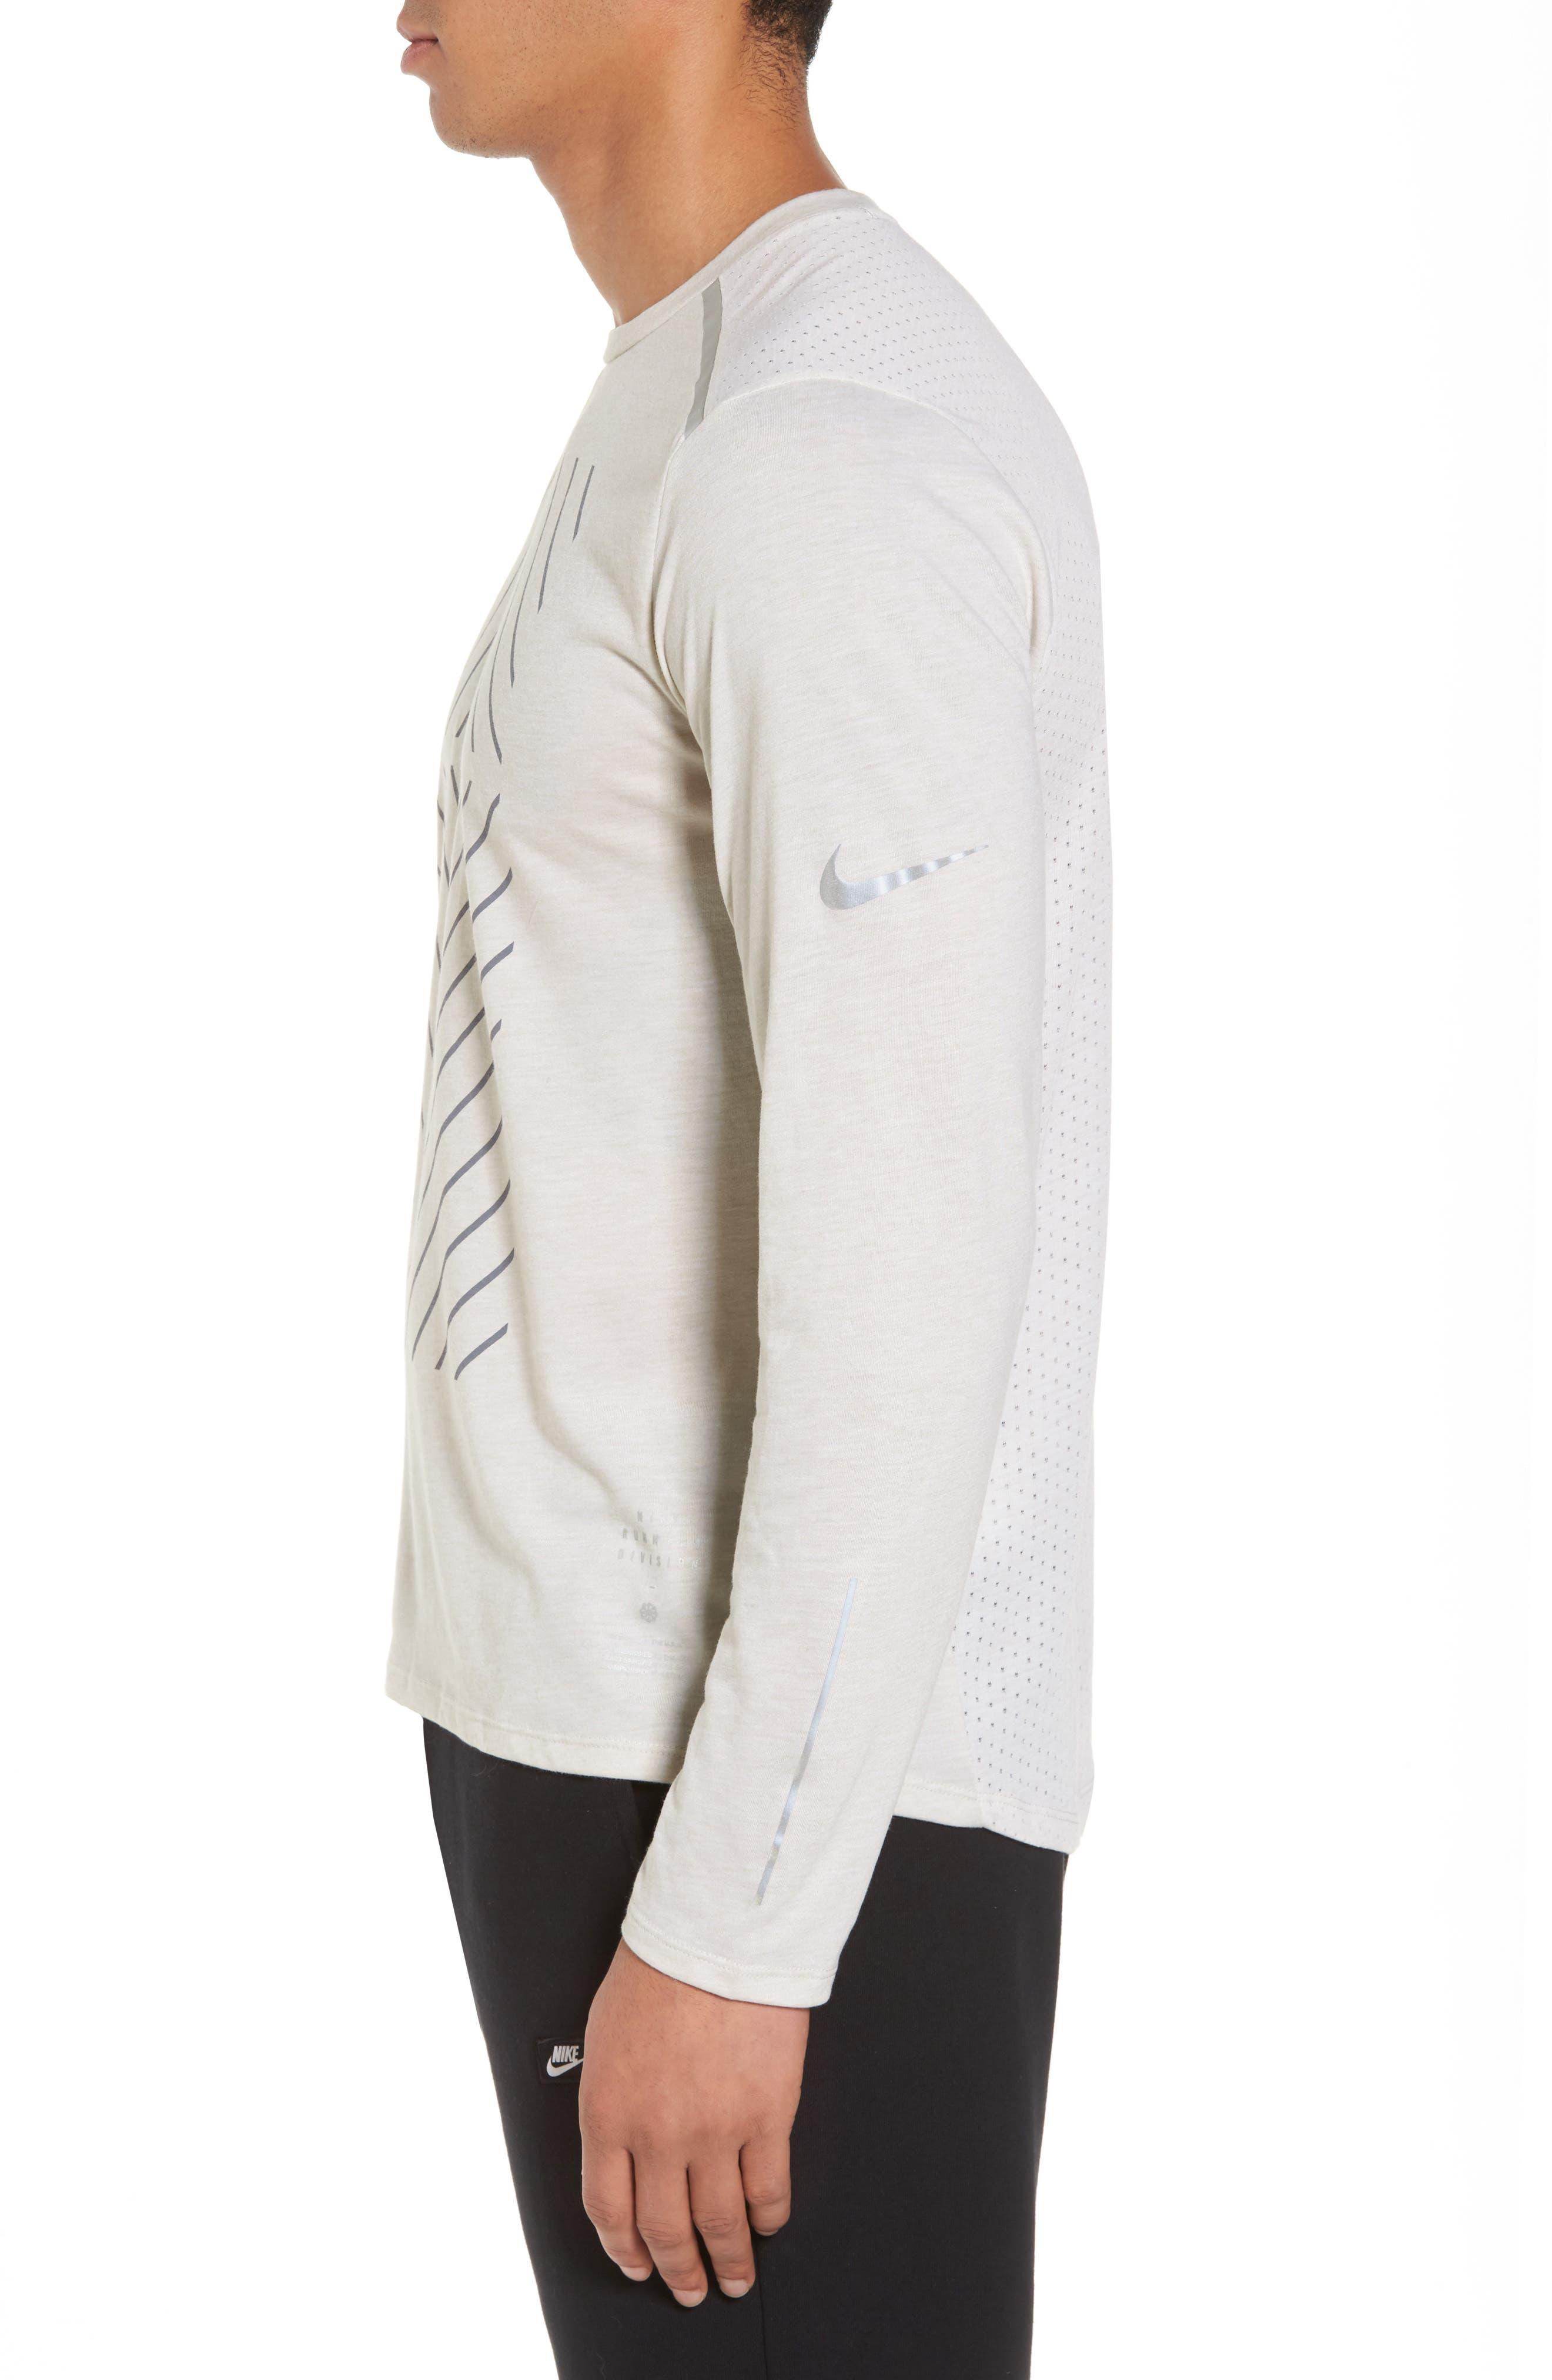 Tailwind Long Sleeve Running T-Shirt,                             Alternate thumbnail 3, color,                             Light Bone/ Heather